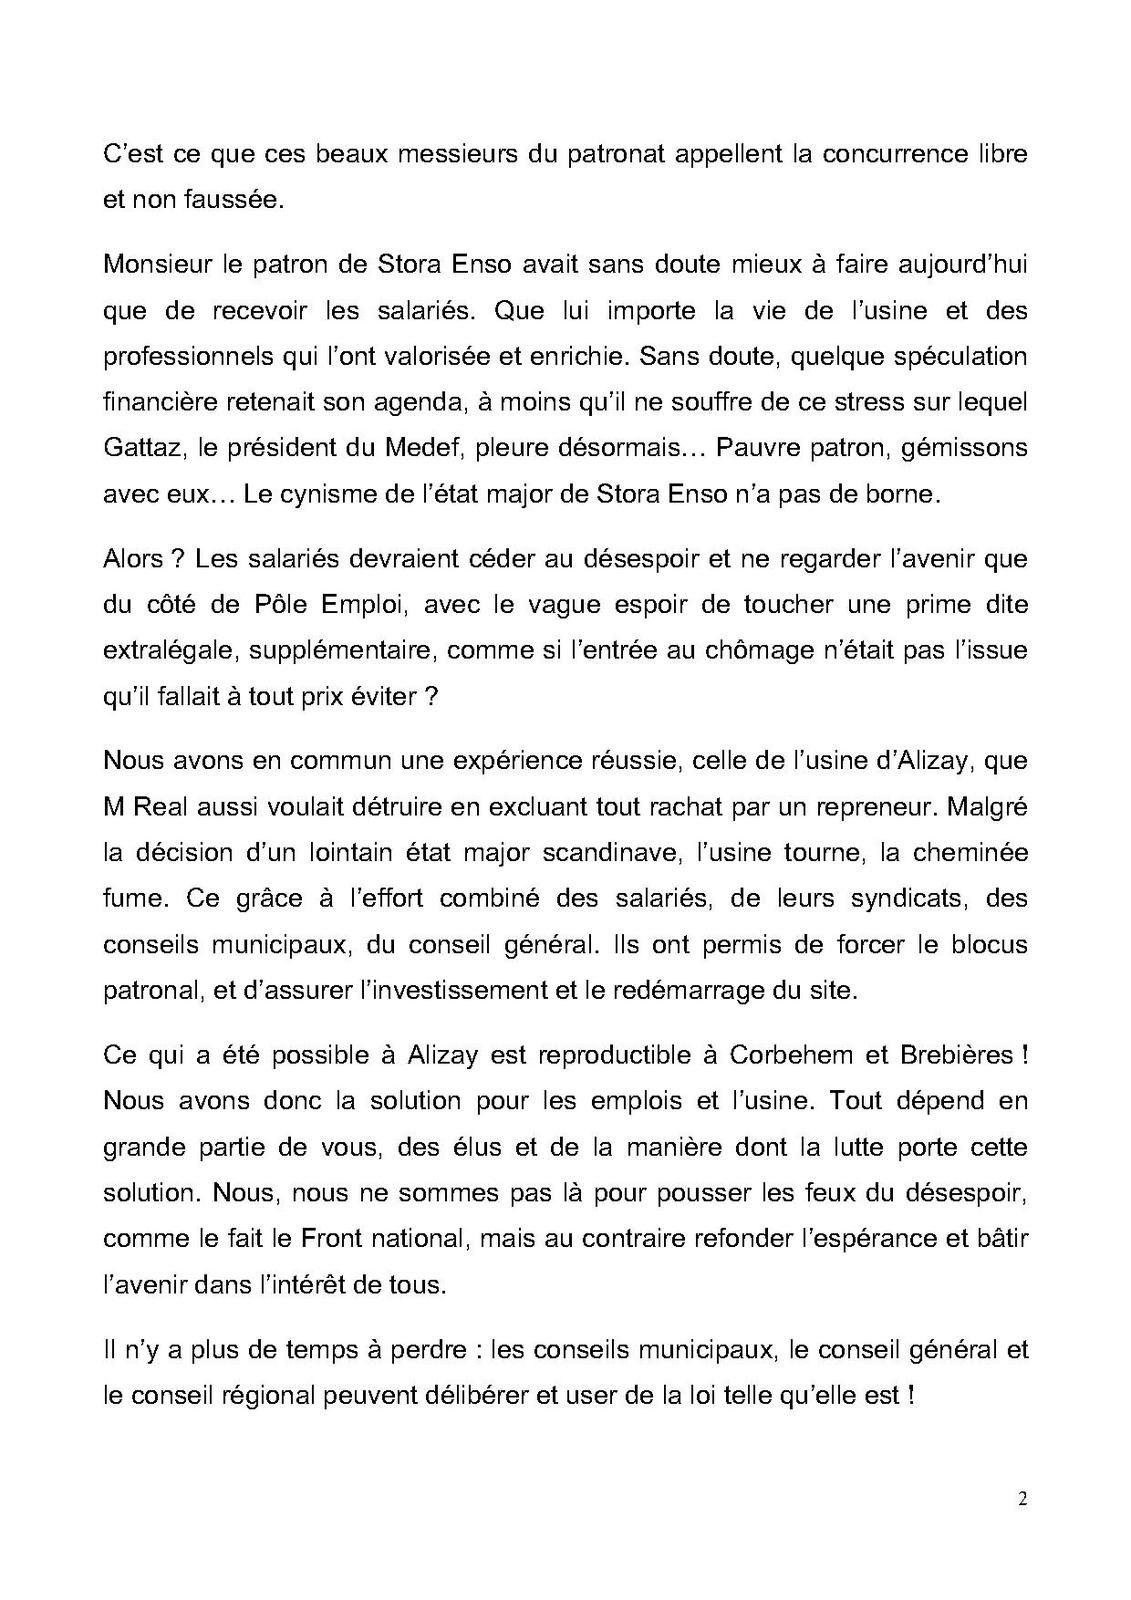 INTERVENTION DE MARC PEYRADE STORA ENSO LA DÉFENSE 20 FÉVRIER